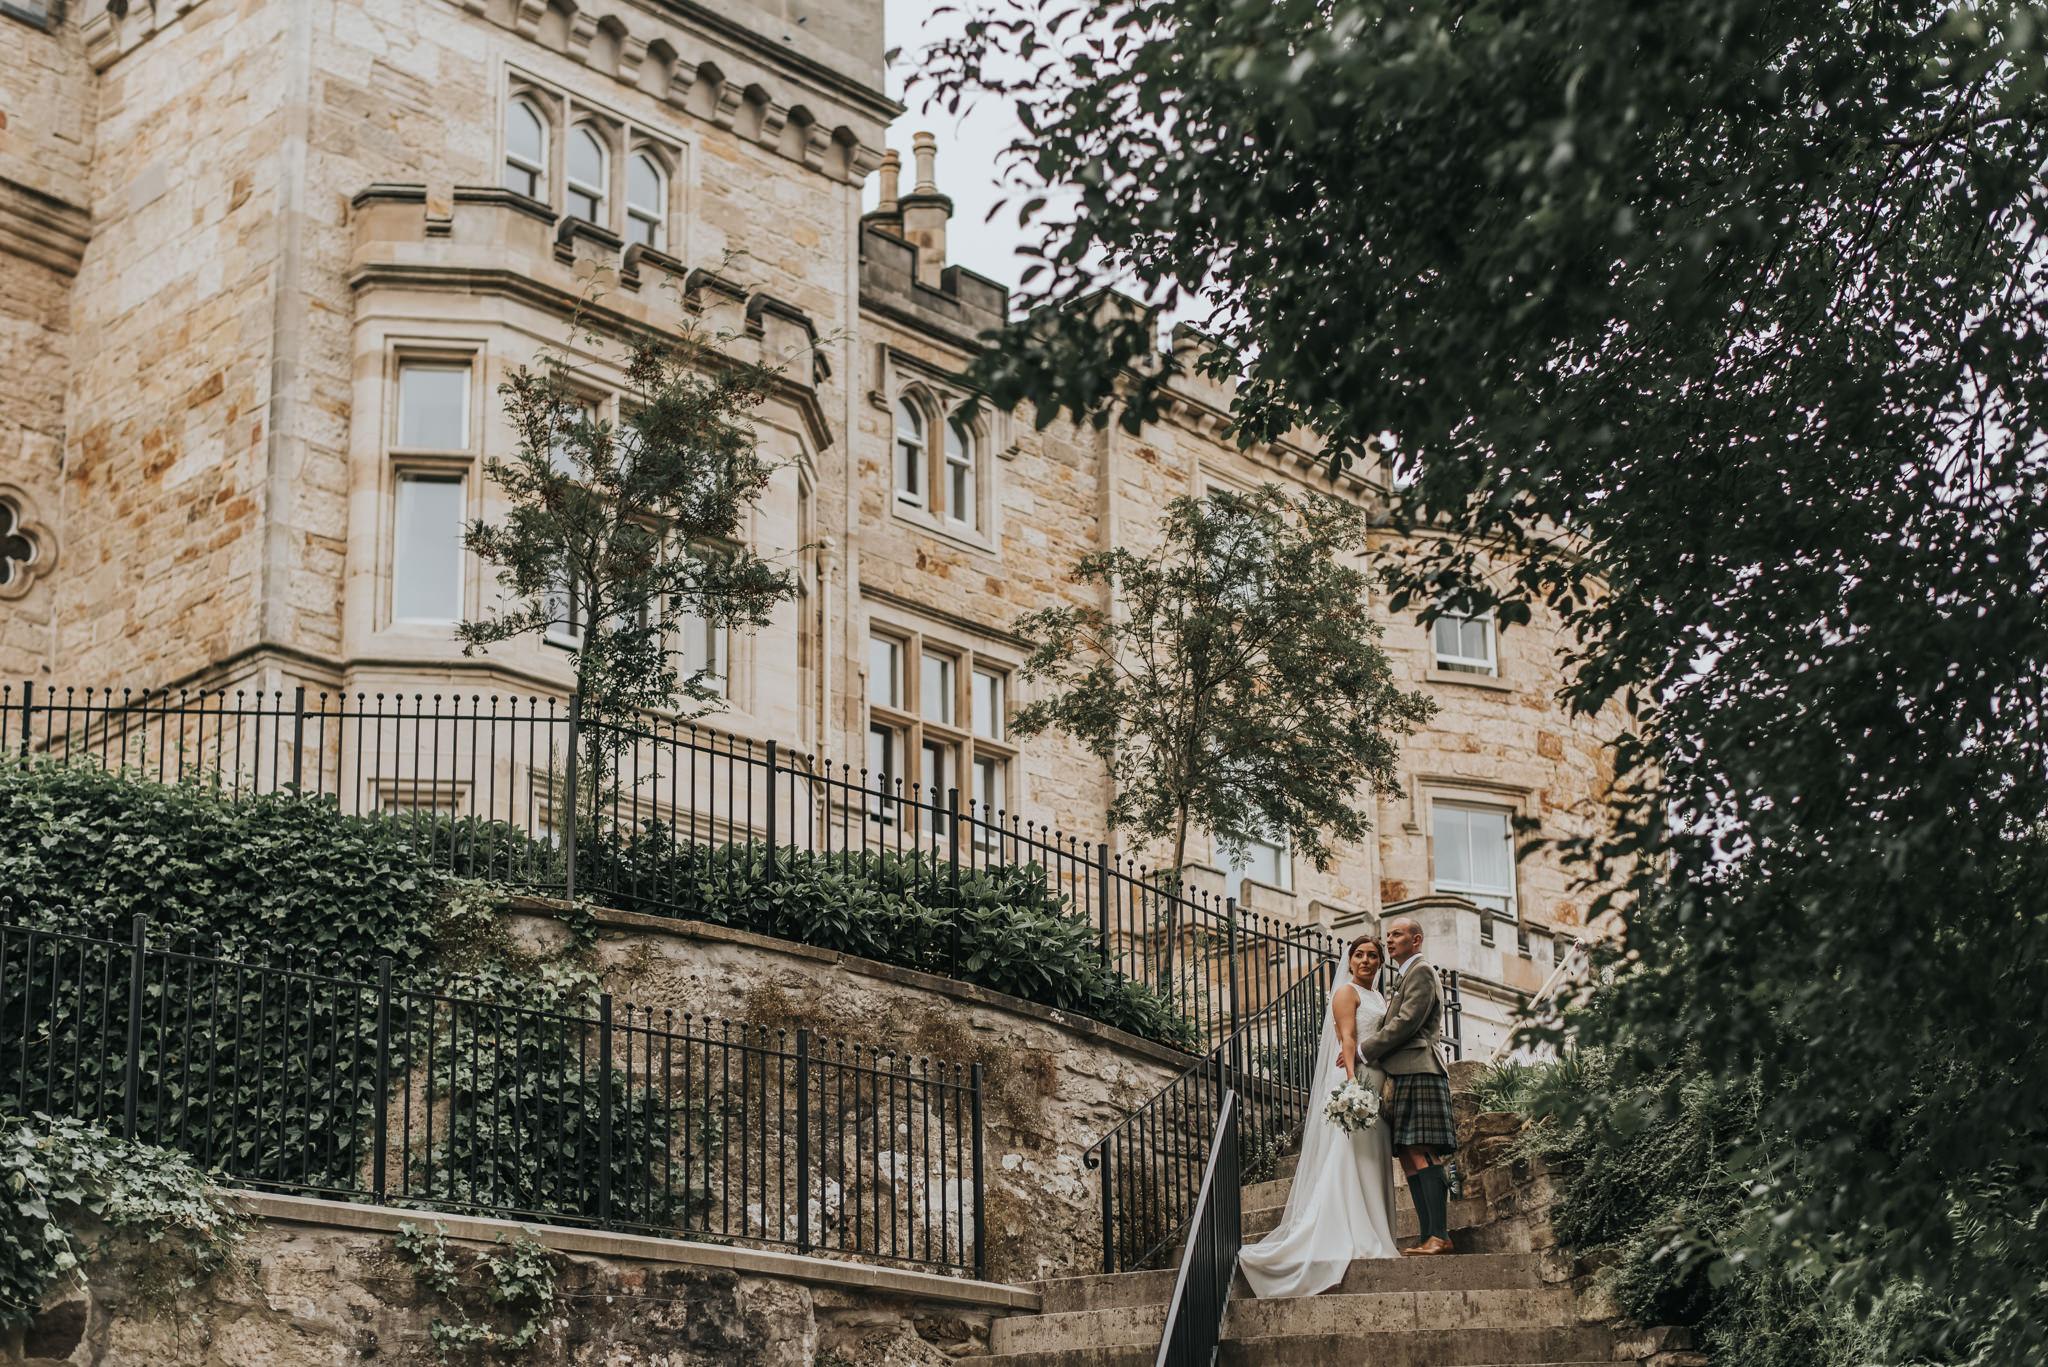 Crossbasket Castle wedding photos, wedding Crossbasket Castle, wedding photographer Edinburgh, wedding photographer Scotland, wedding photographer Glasgow, Karol Makula Photography, wedding photography Scotland, Scotland wedding photographer